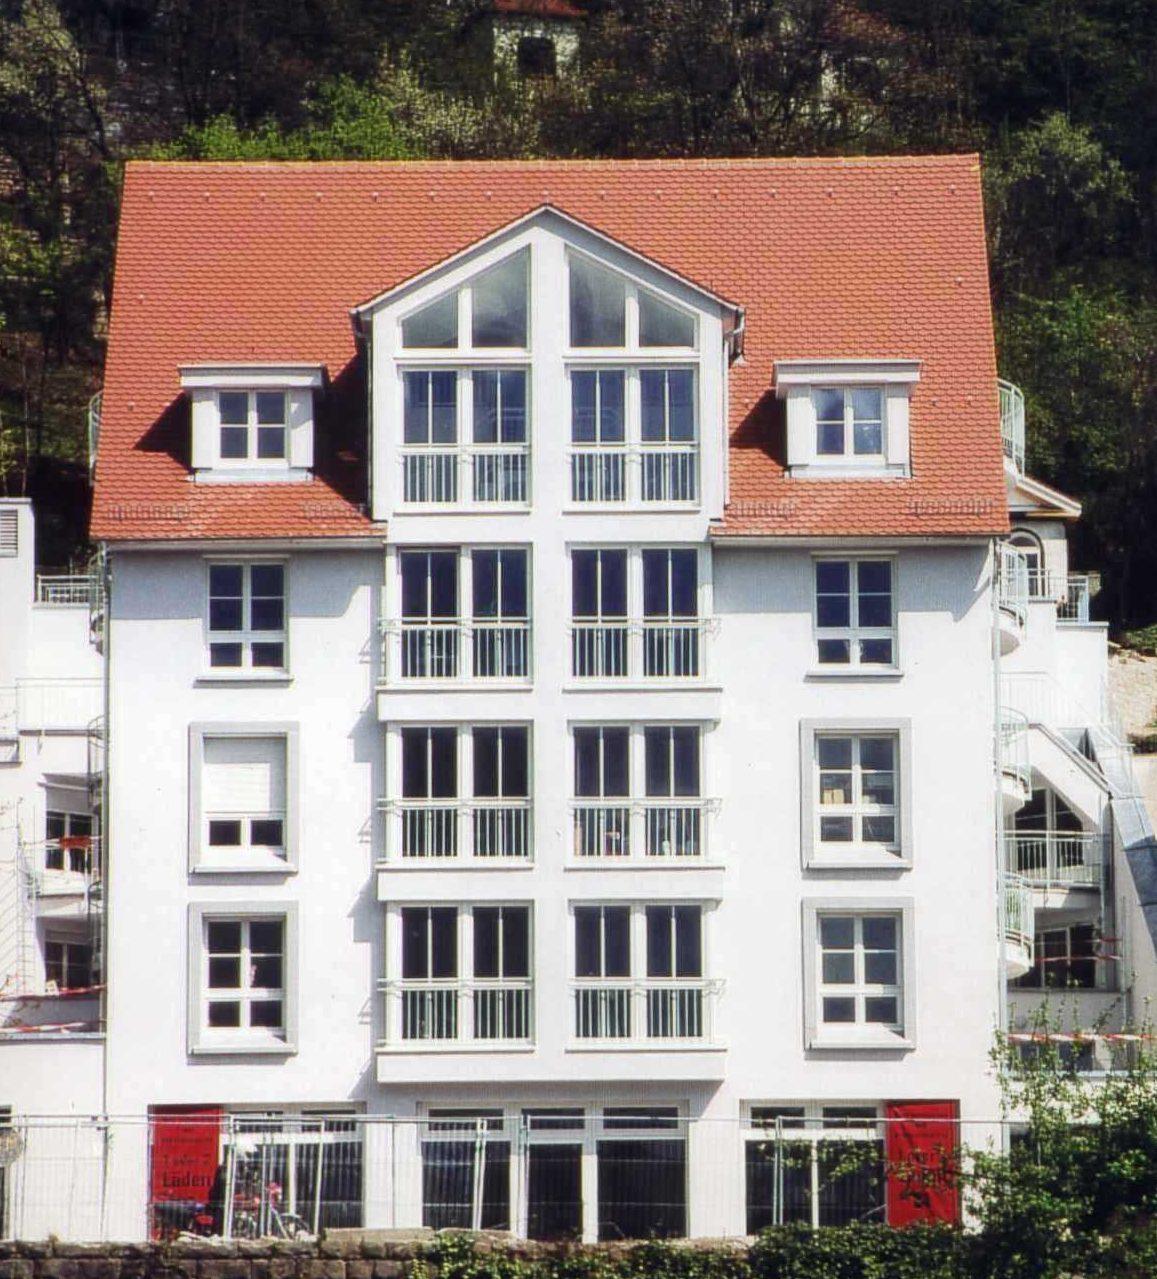 Gewerbeeinheit – Gartenstraße 9/1 in Tübingen